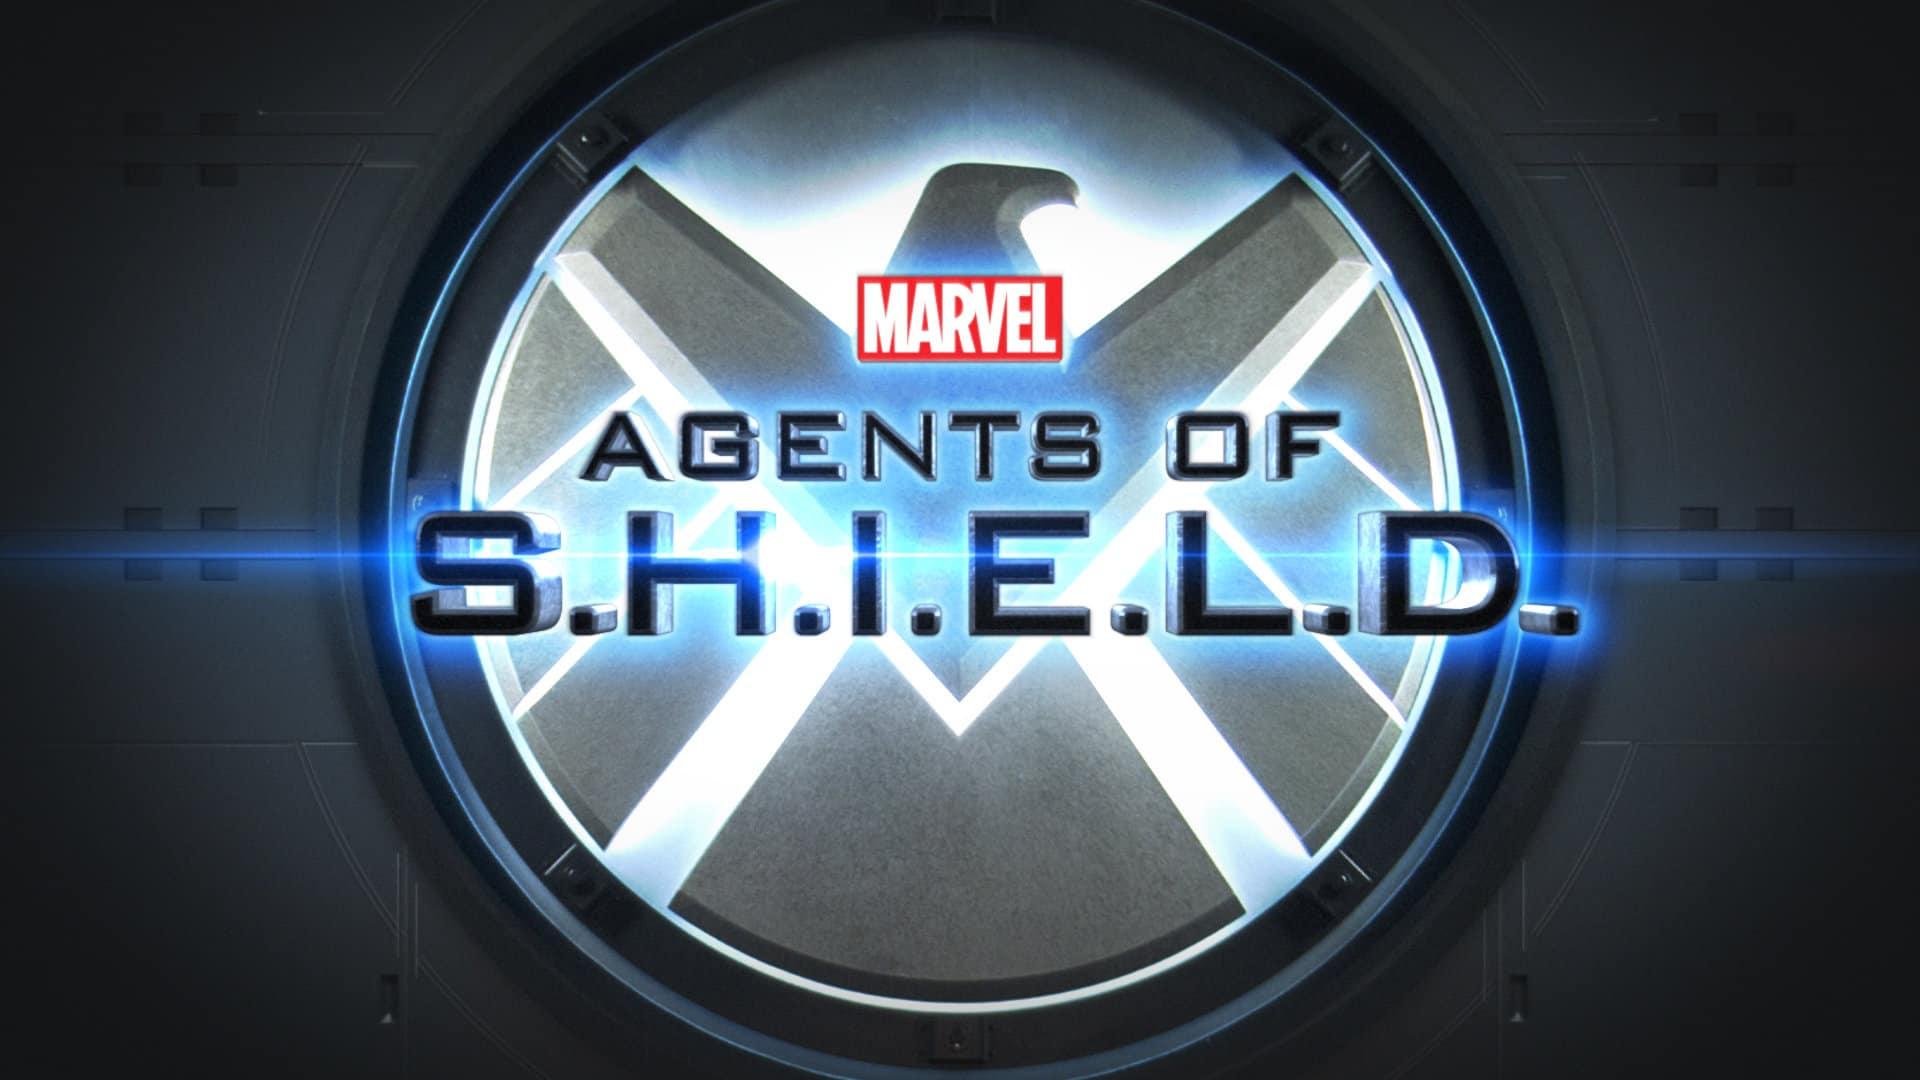 Marvel Agents of shield logo